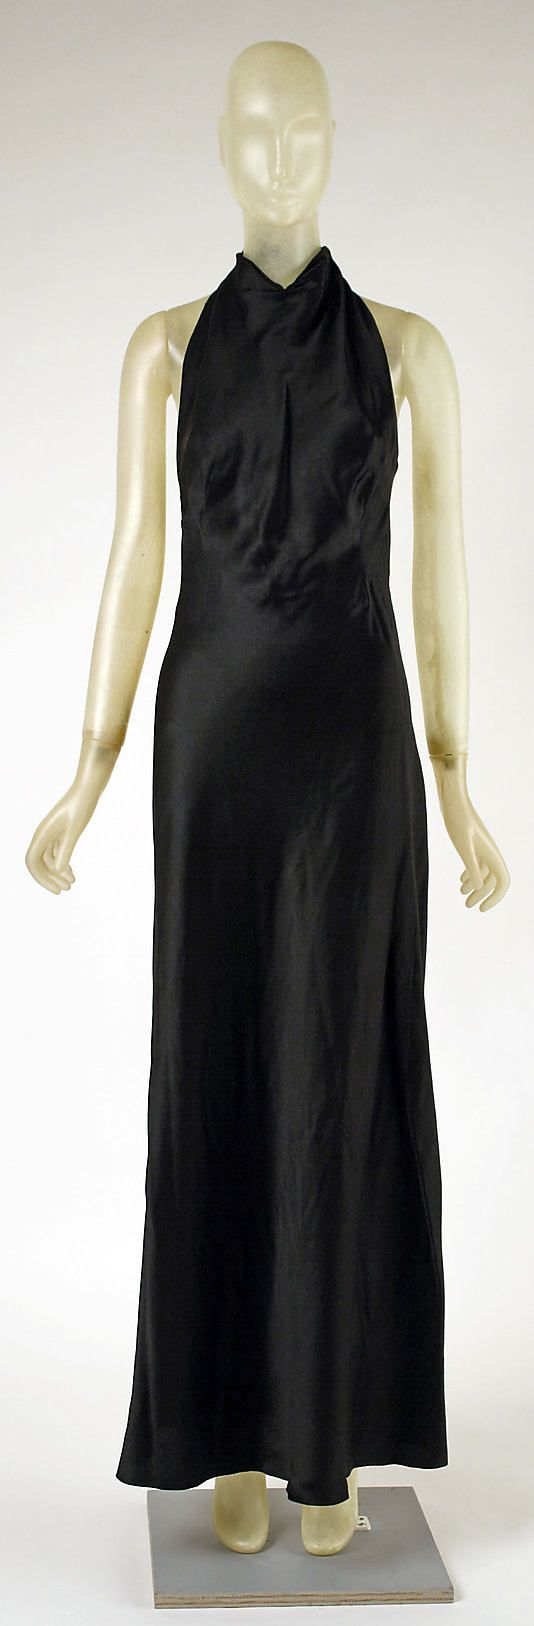 "The Metropolitan Museum of Art - ""Carnival Dress"" Madeleine Vionnet  (French, Chilleurs-aux-Bois 1876–1975 Paris)   Date: 1936 Culture: French Medium: silk Under Dress"